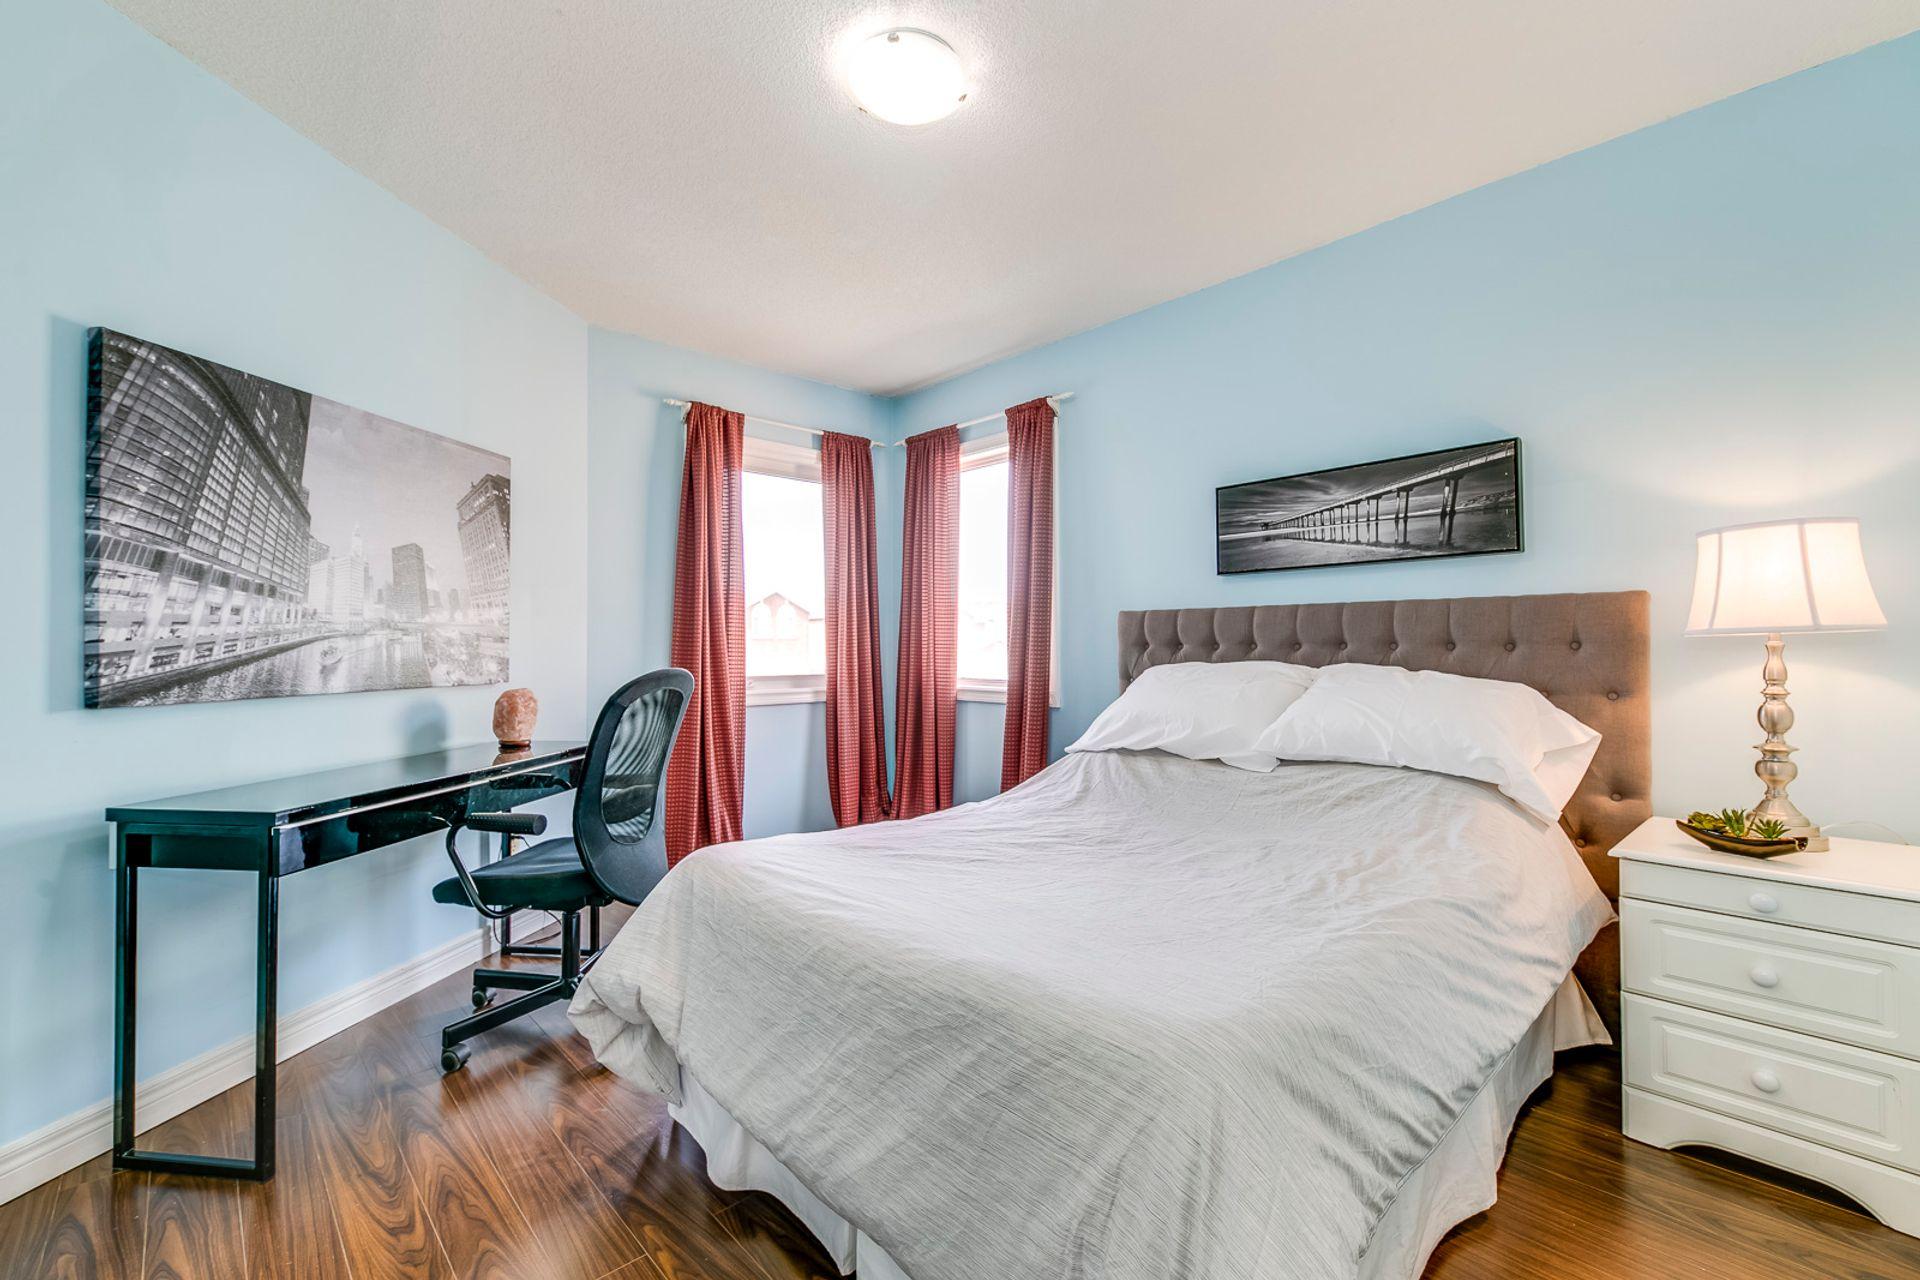 3rd Bedroom - 972 Winterton Way, Mississauga - Elite3 & Team at 972 Winterton Way, East Credit, Mississauga